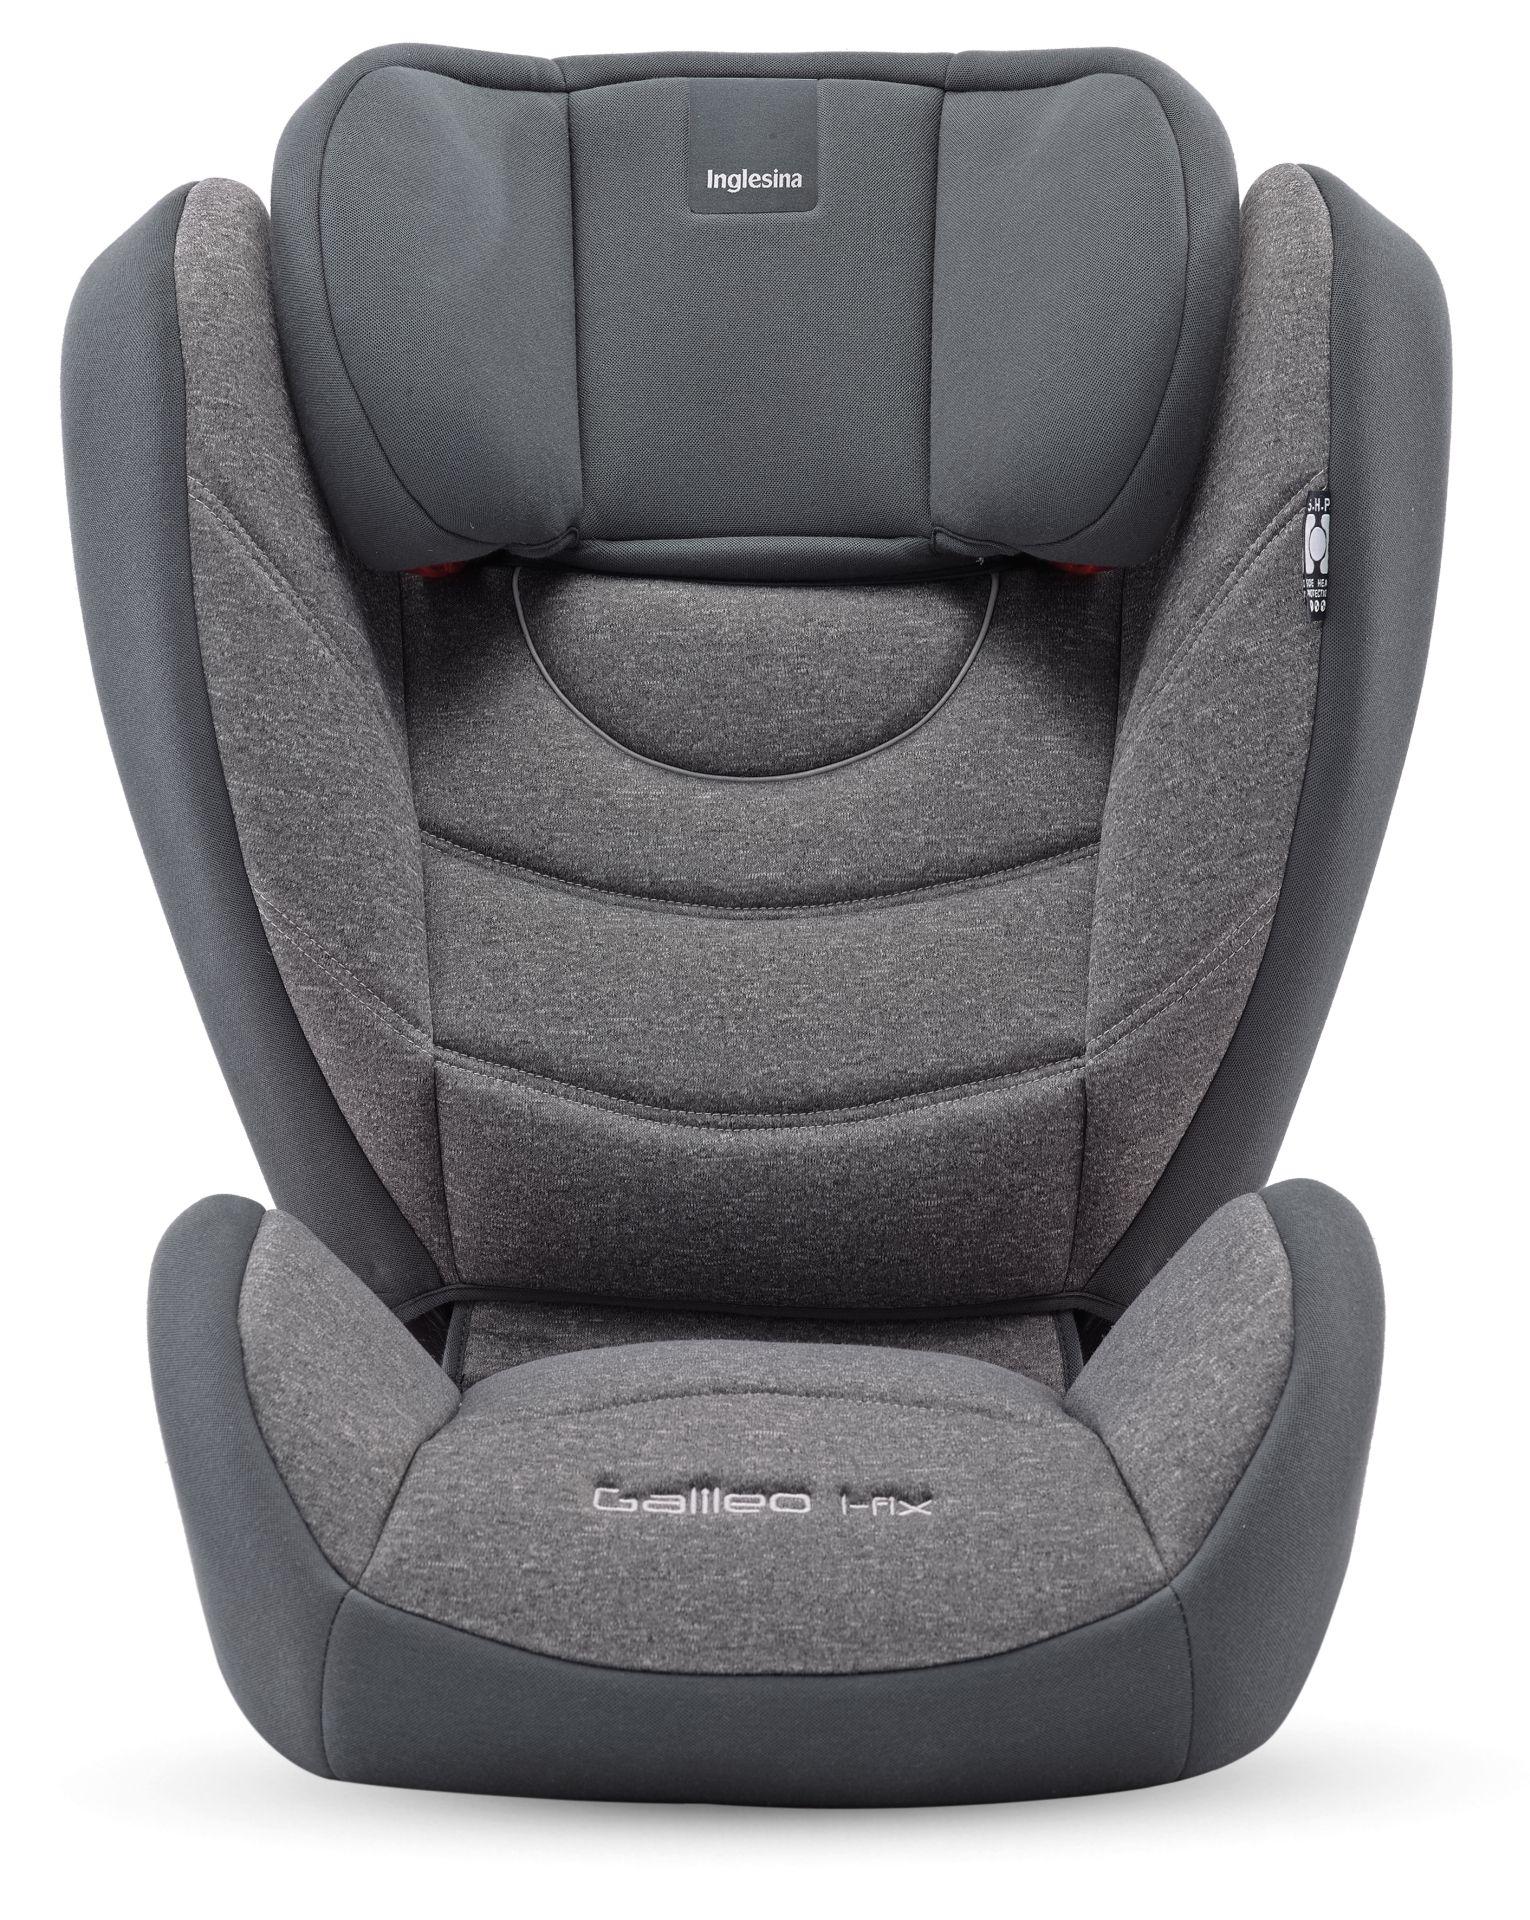 inglesina baby car seat instructions